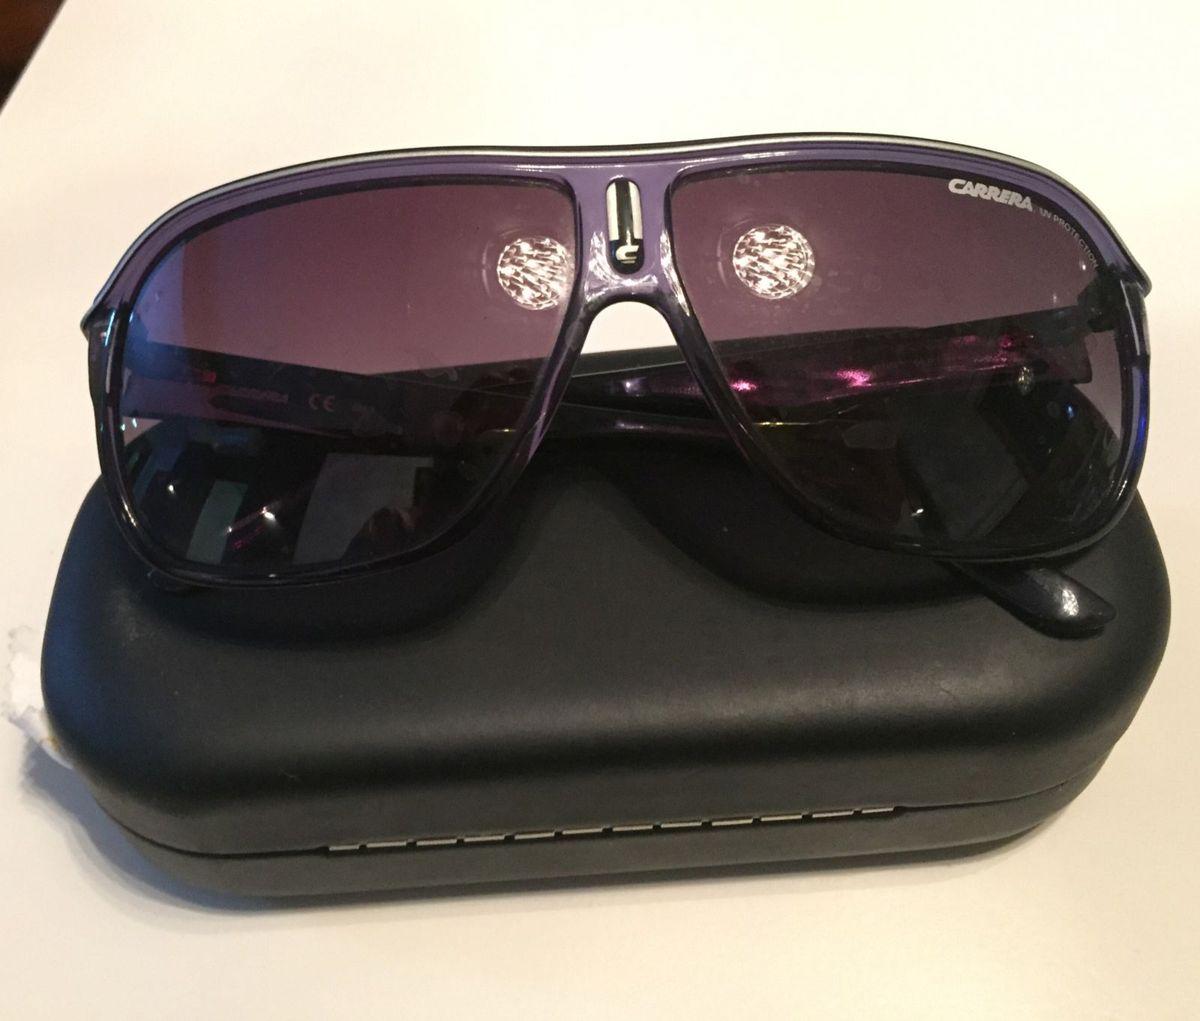 a3a3c4c275531 carreira - óculos de sol - óculos carreira.  Czm6ly9wag90b3muzw5qb2vplmnvbs5ici9wcm9kdwn0cy81ntc0mjcxlzflntcymtfimdlmyjq1mzg5mdg0n2zlmzi0zgfmyjkylmpwzw  ...